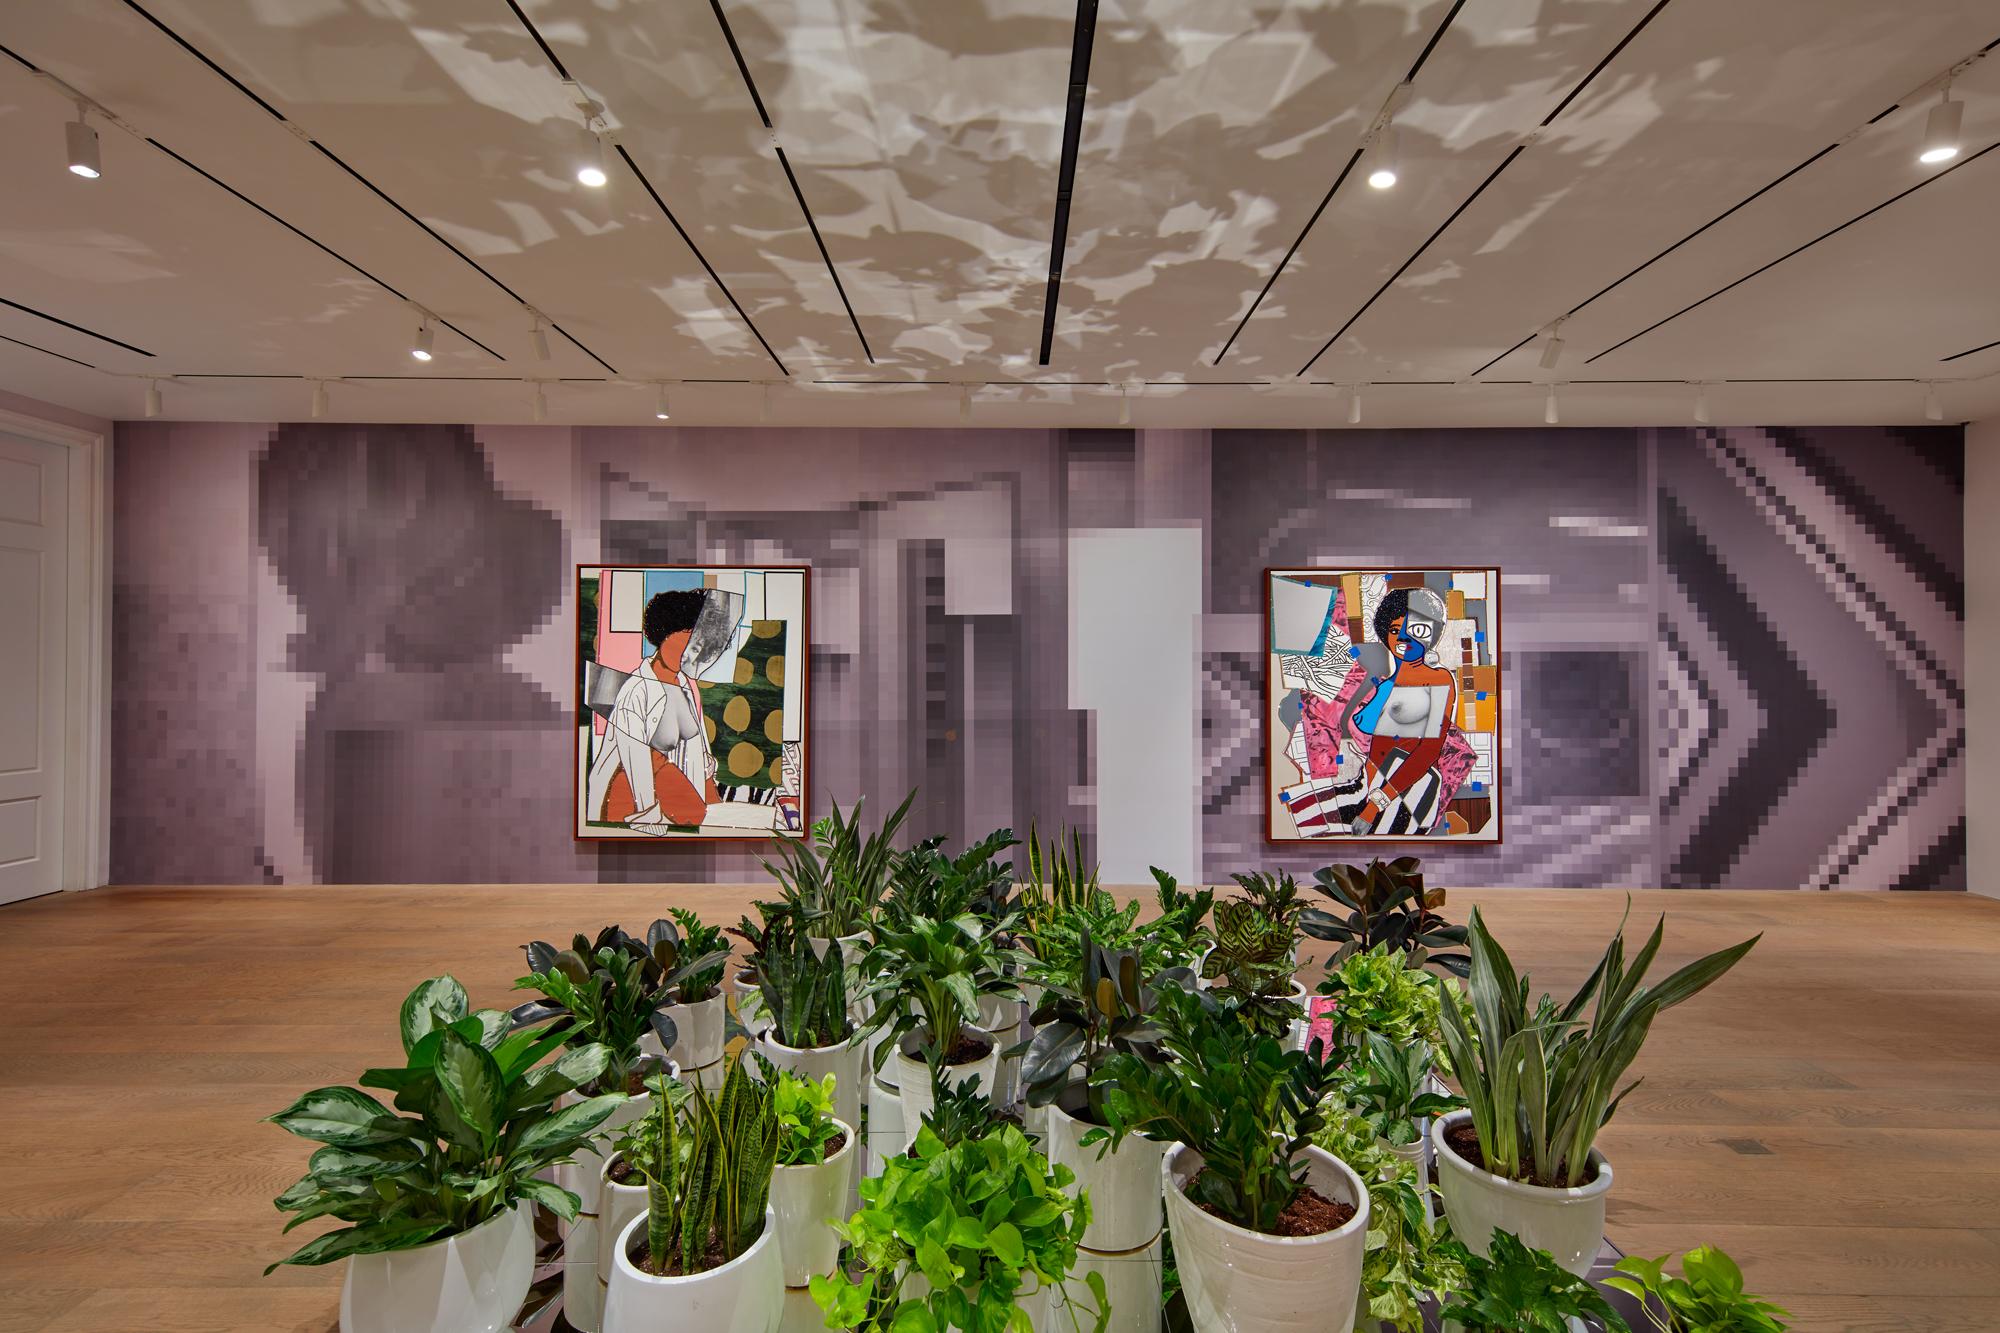 Installation view of 'Mickalene Thomas: Beyond the Pleasure Principle' at Lévy Gorvy, New York. © Tom Powel